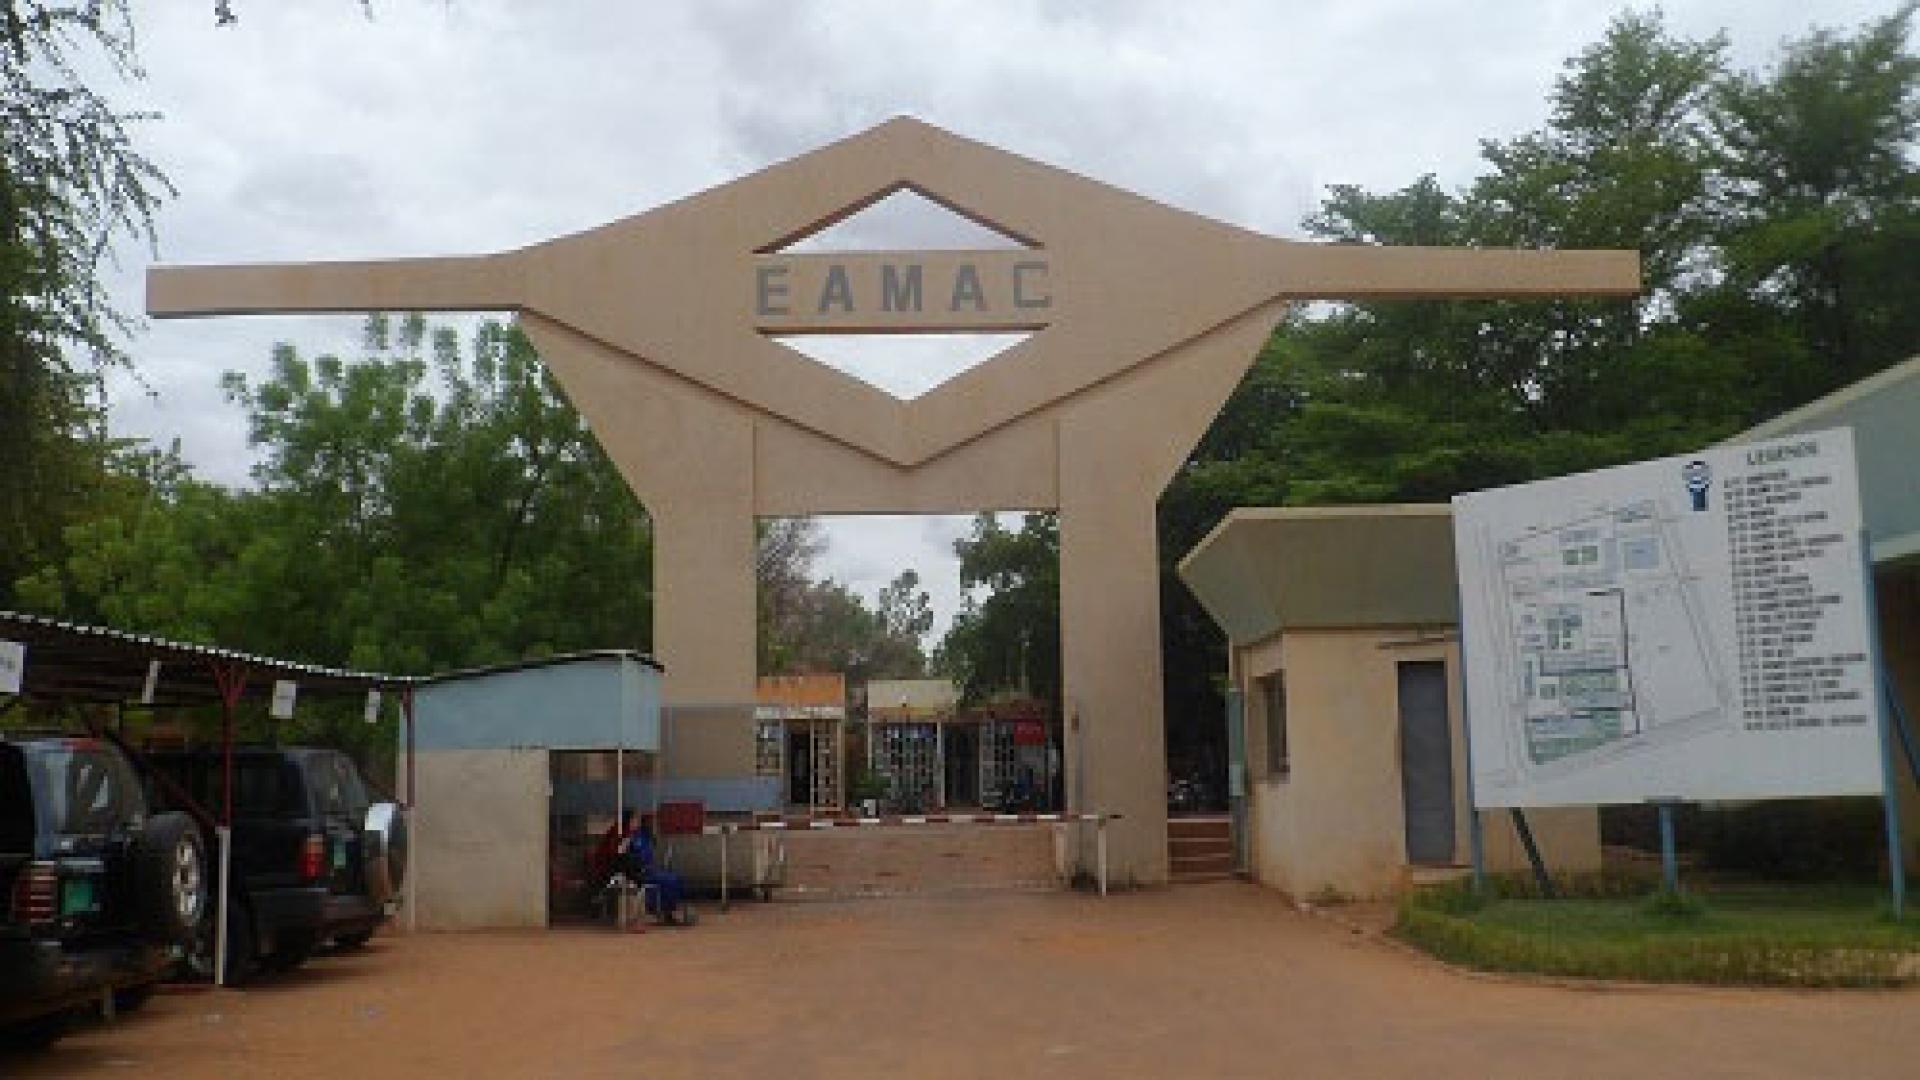 EAMAC headquarters